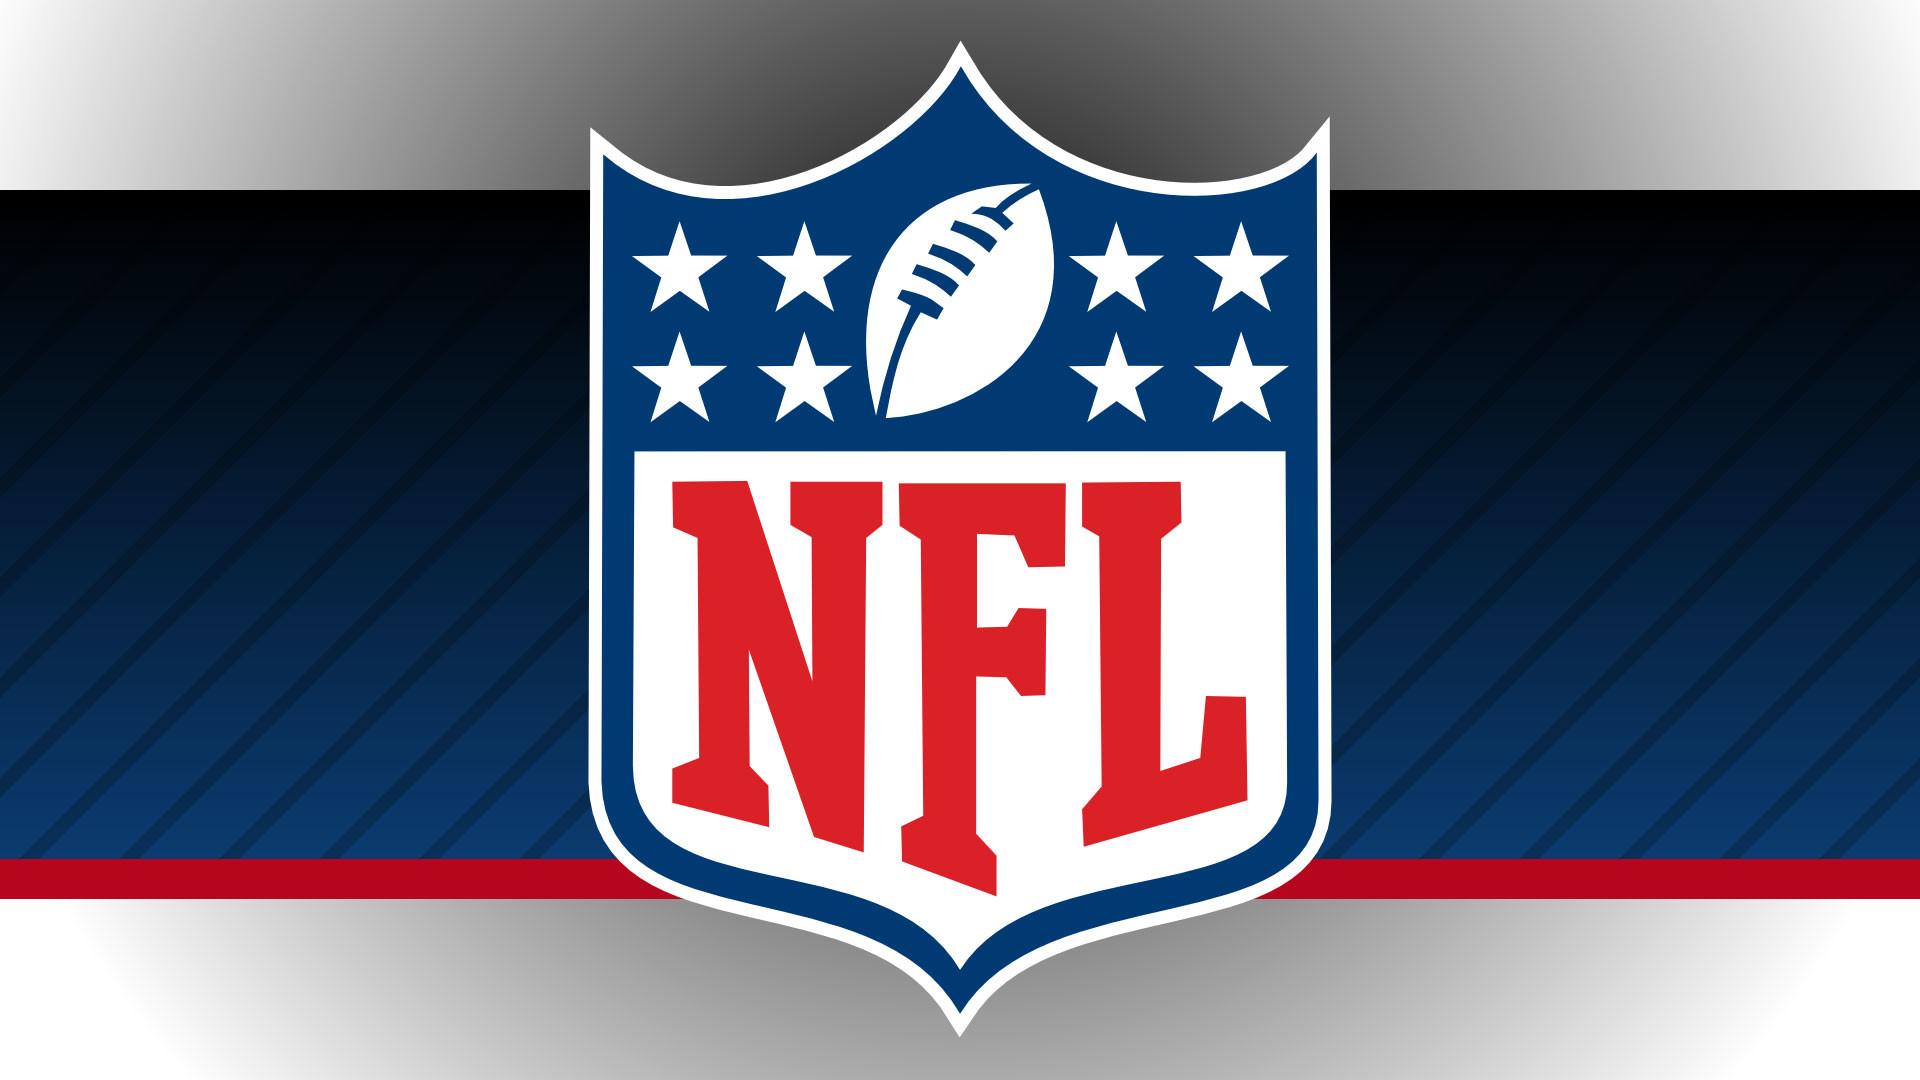 Nfl Professional American Football